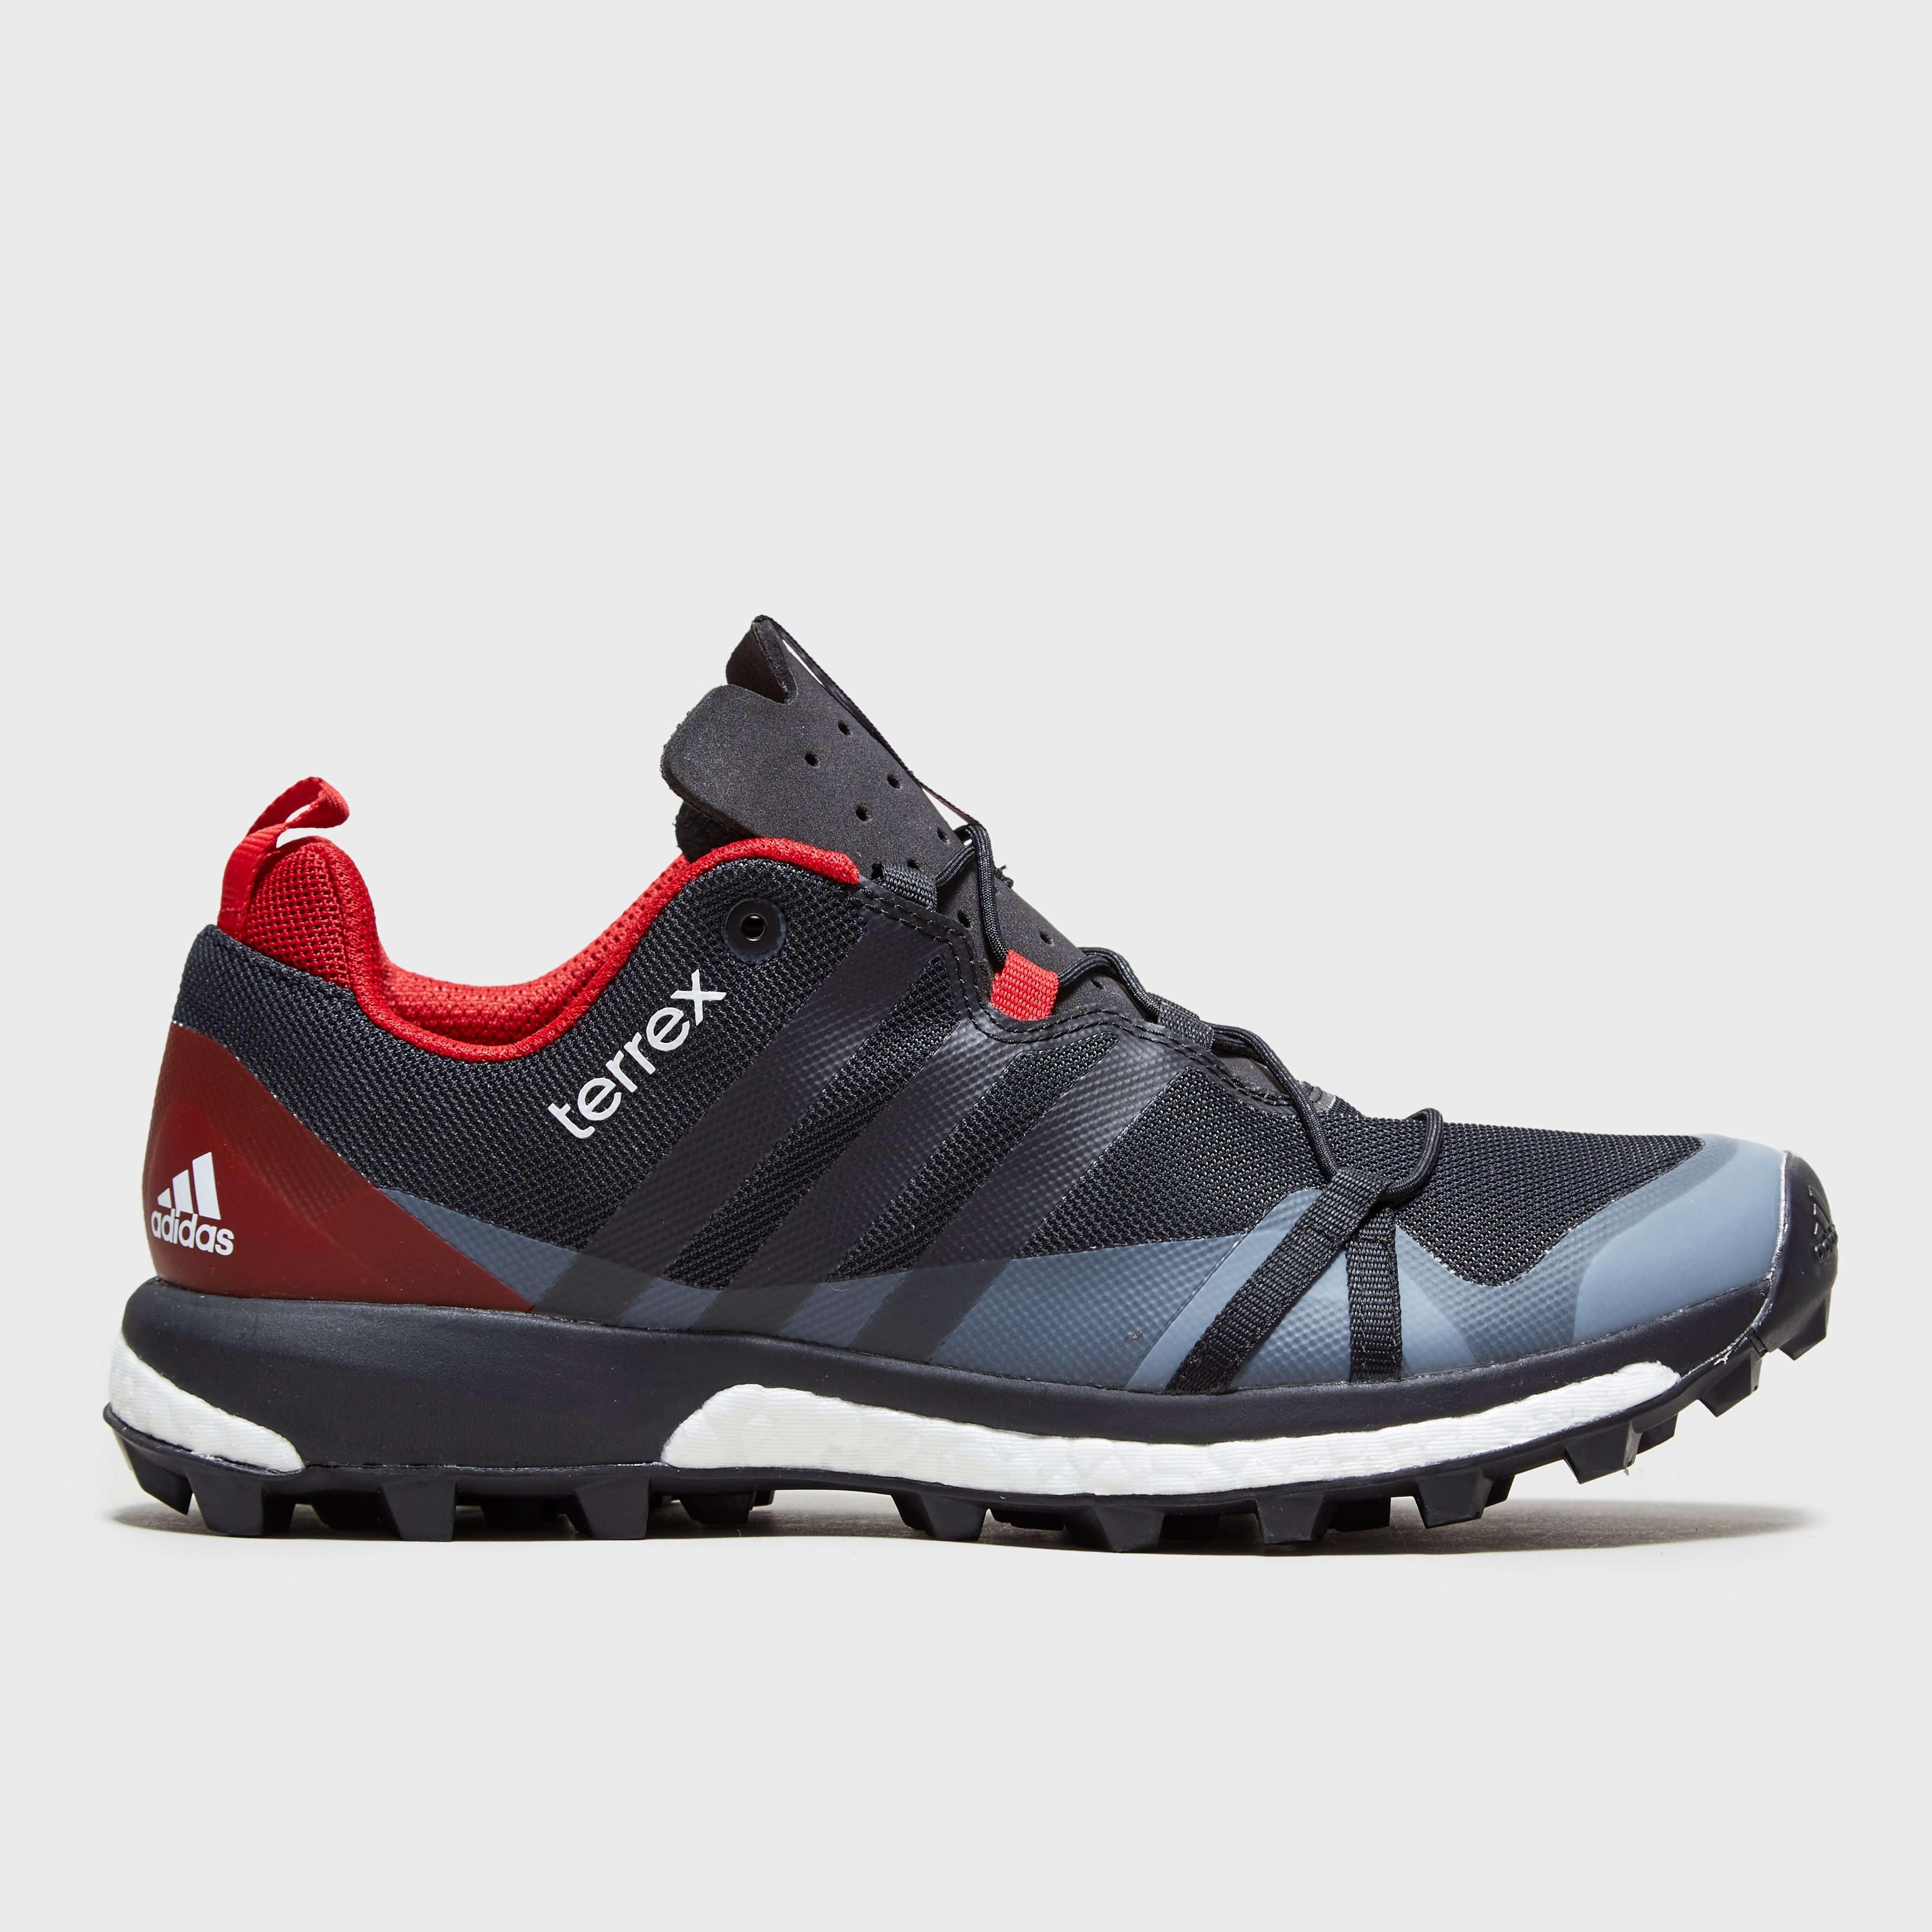 ADIDAS Men's Terrex Agravic Boost™ Shoe